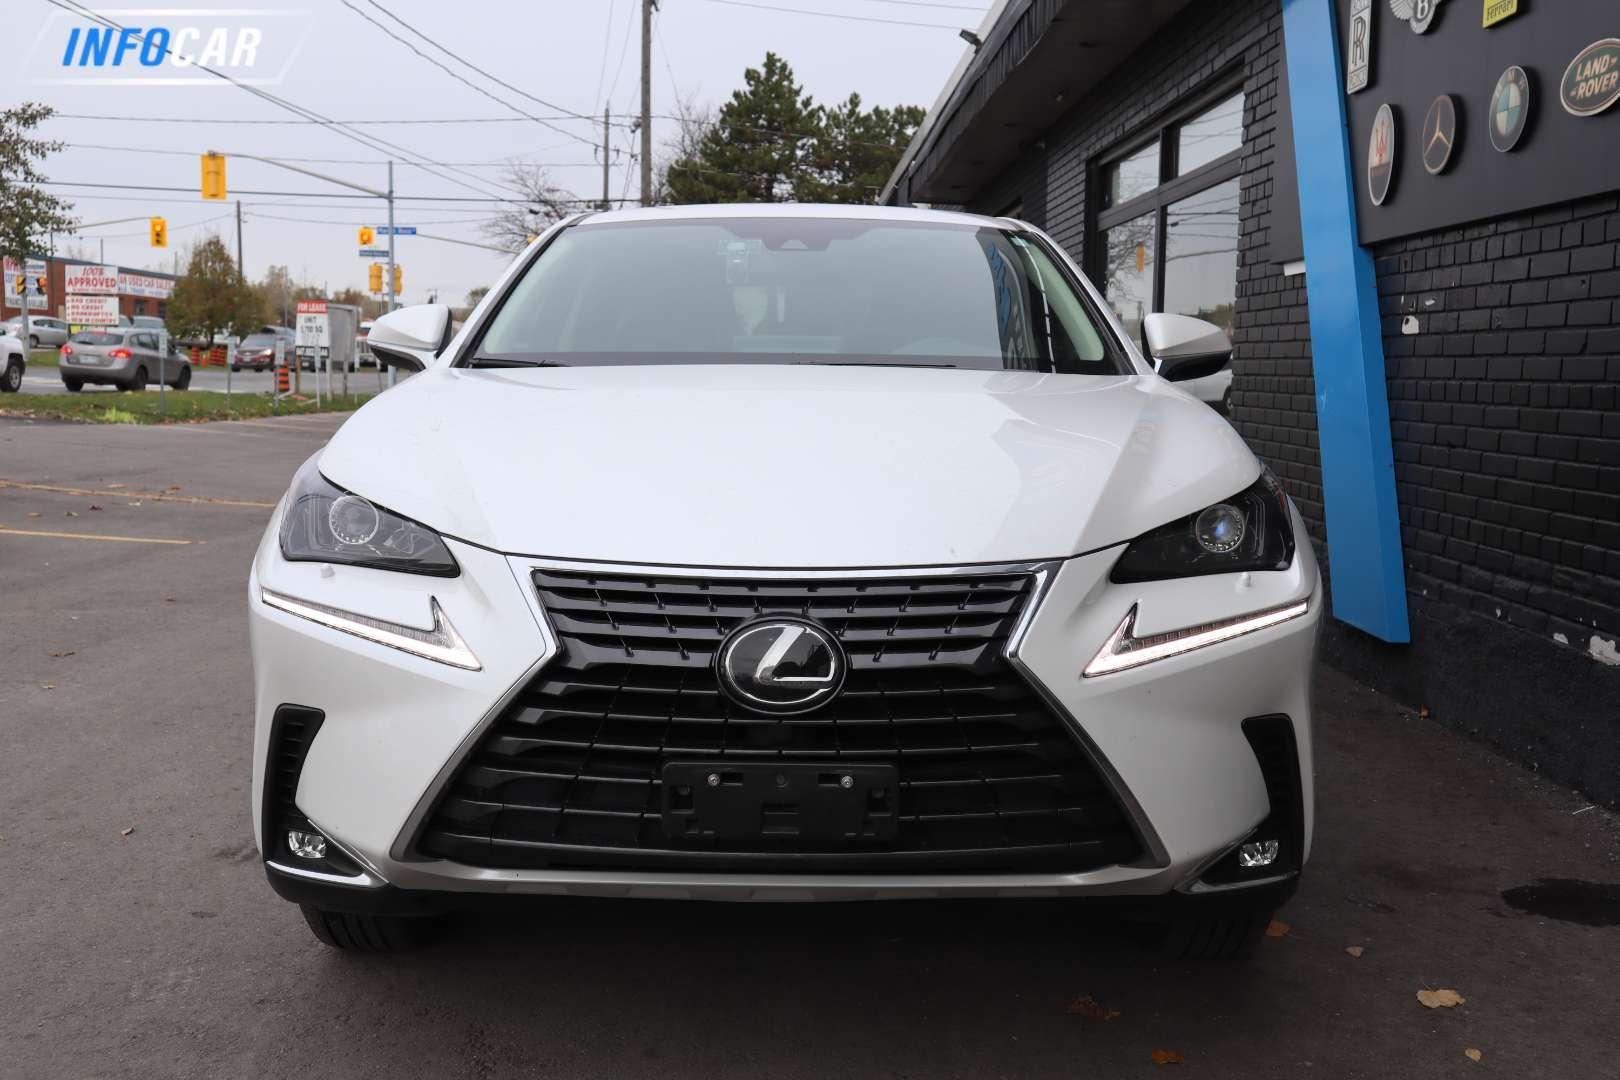 2020 Lexus NX 300  - INFOCAR - Toronto's Most Comprehensive New and Used Auto Trading Platform